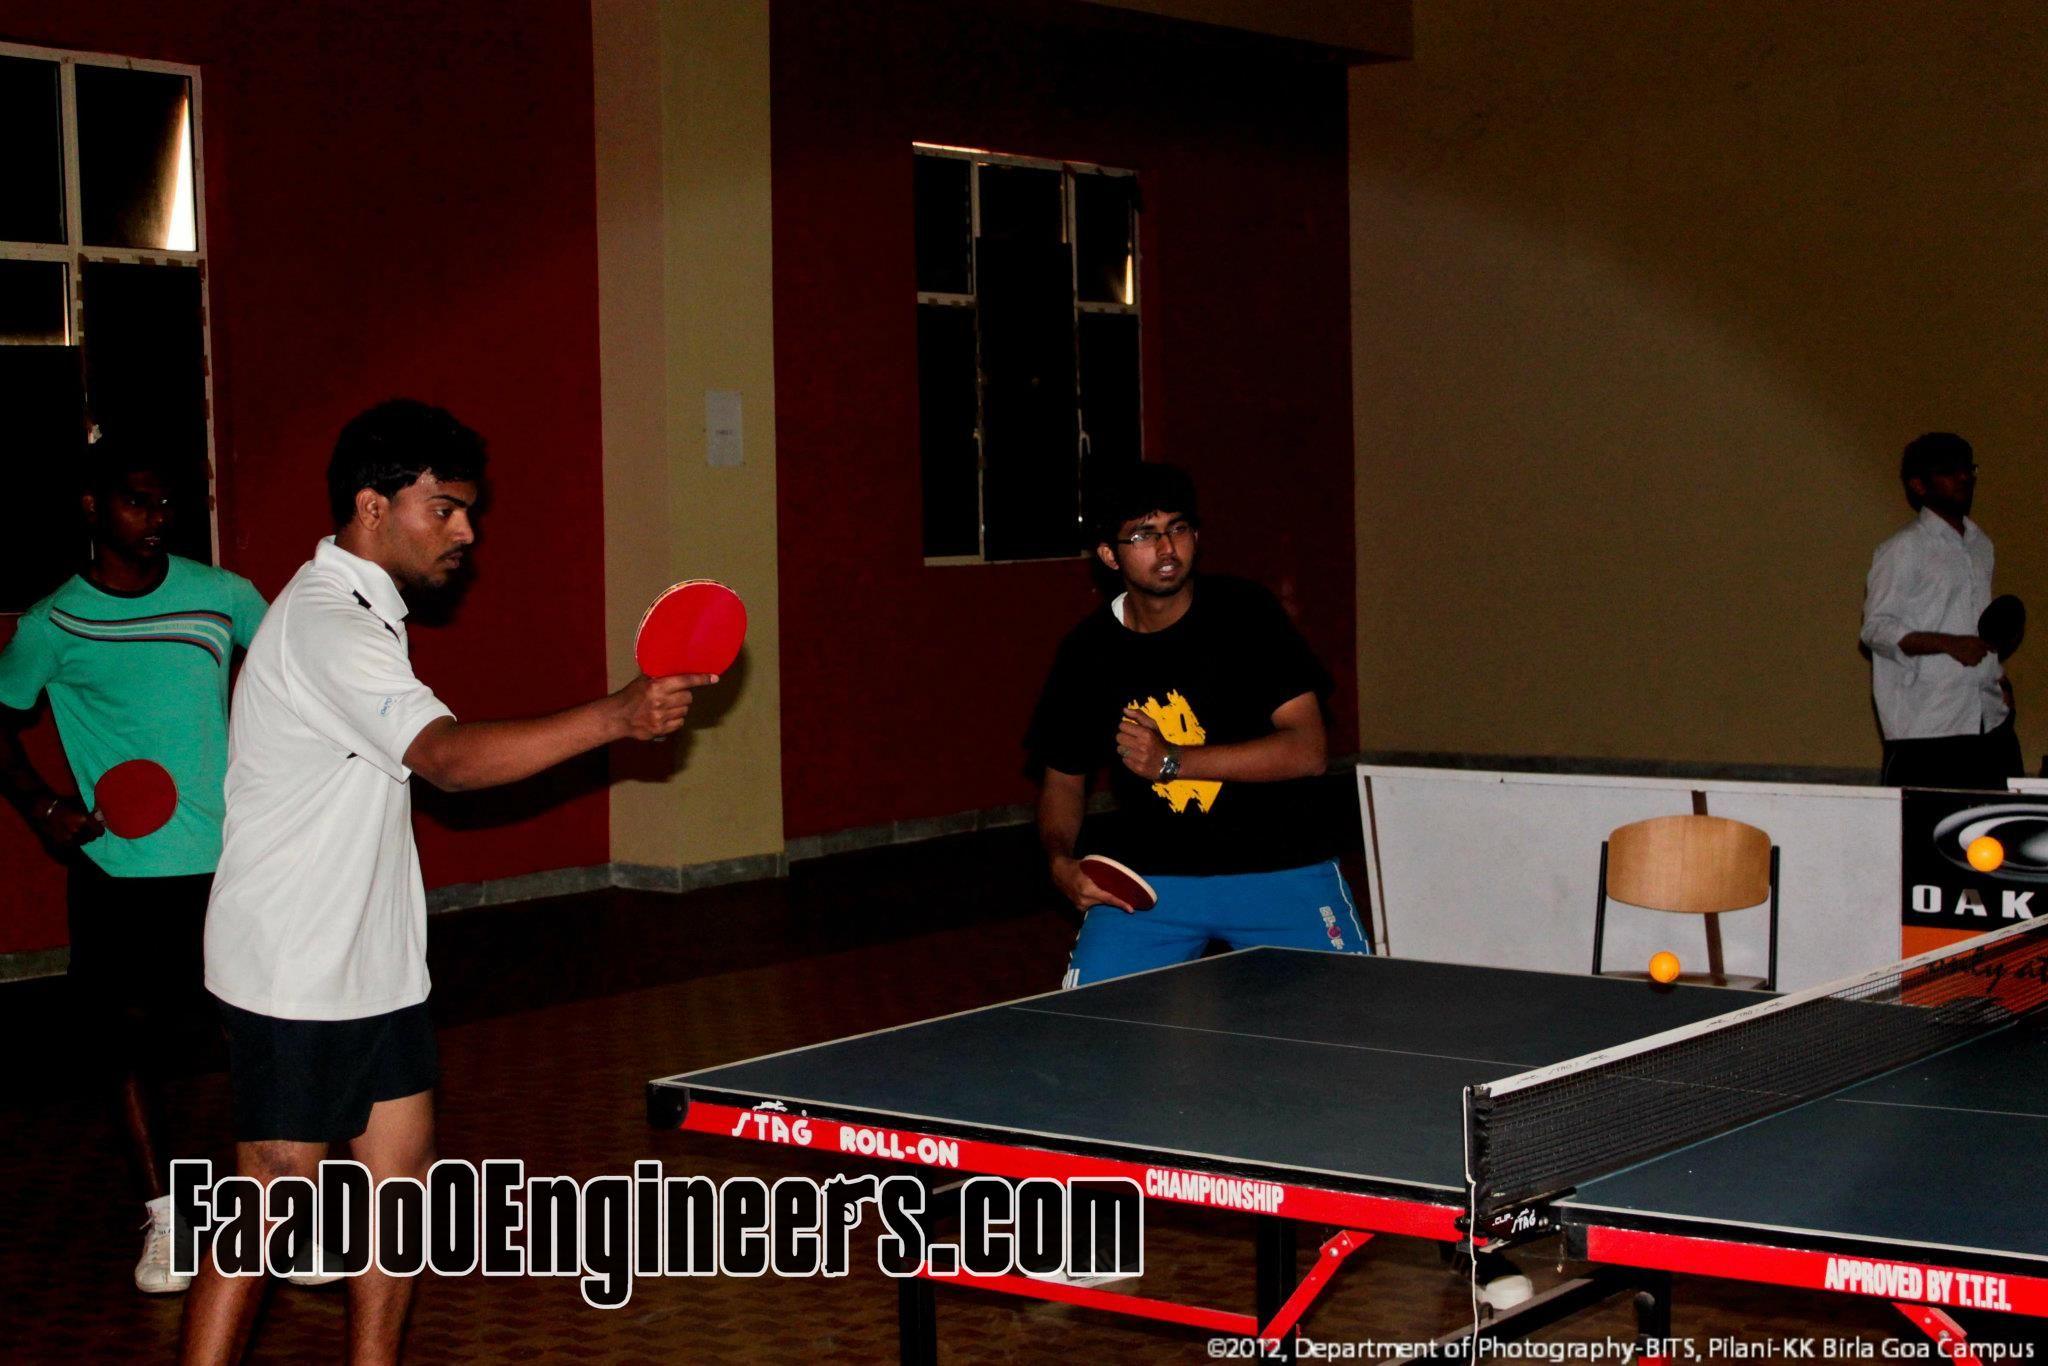 spree-2013-bits-pilani-goa-campus-sports-fest-photos-gallery-007